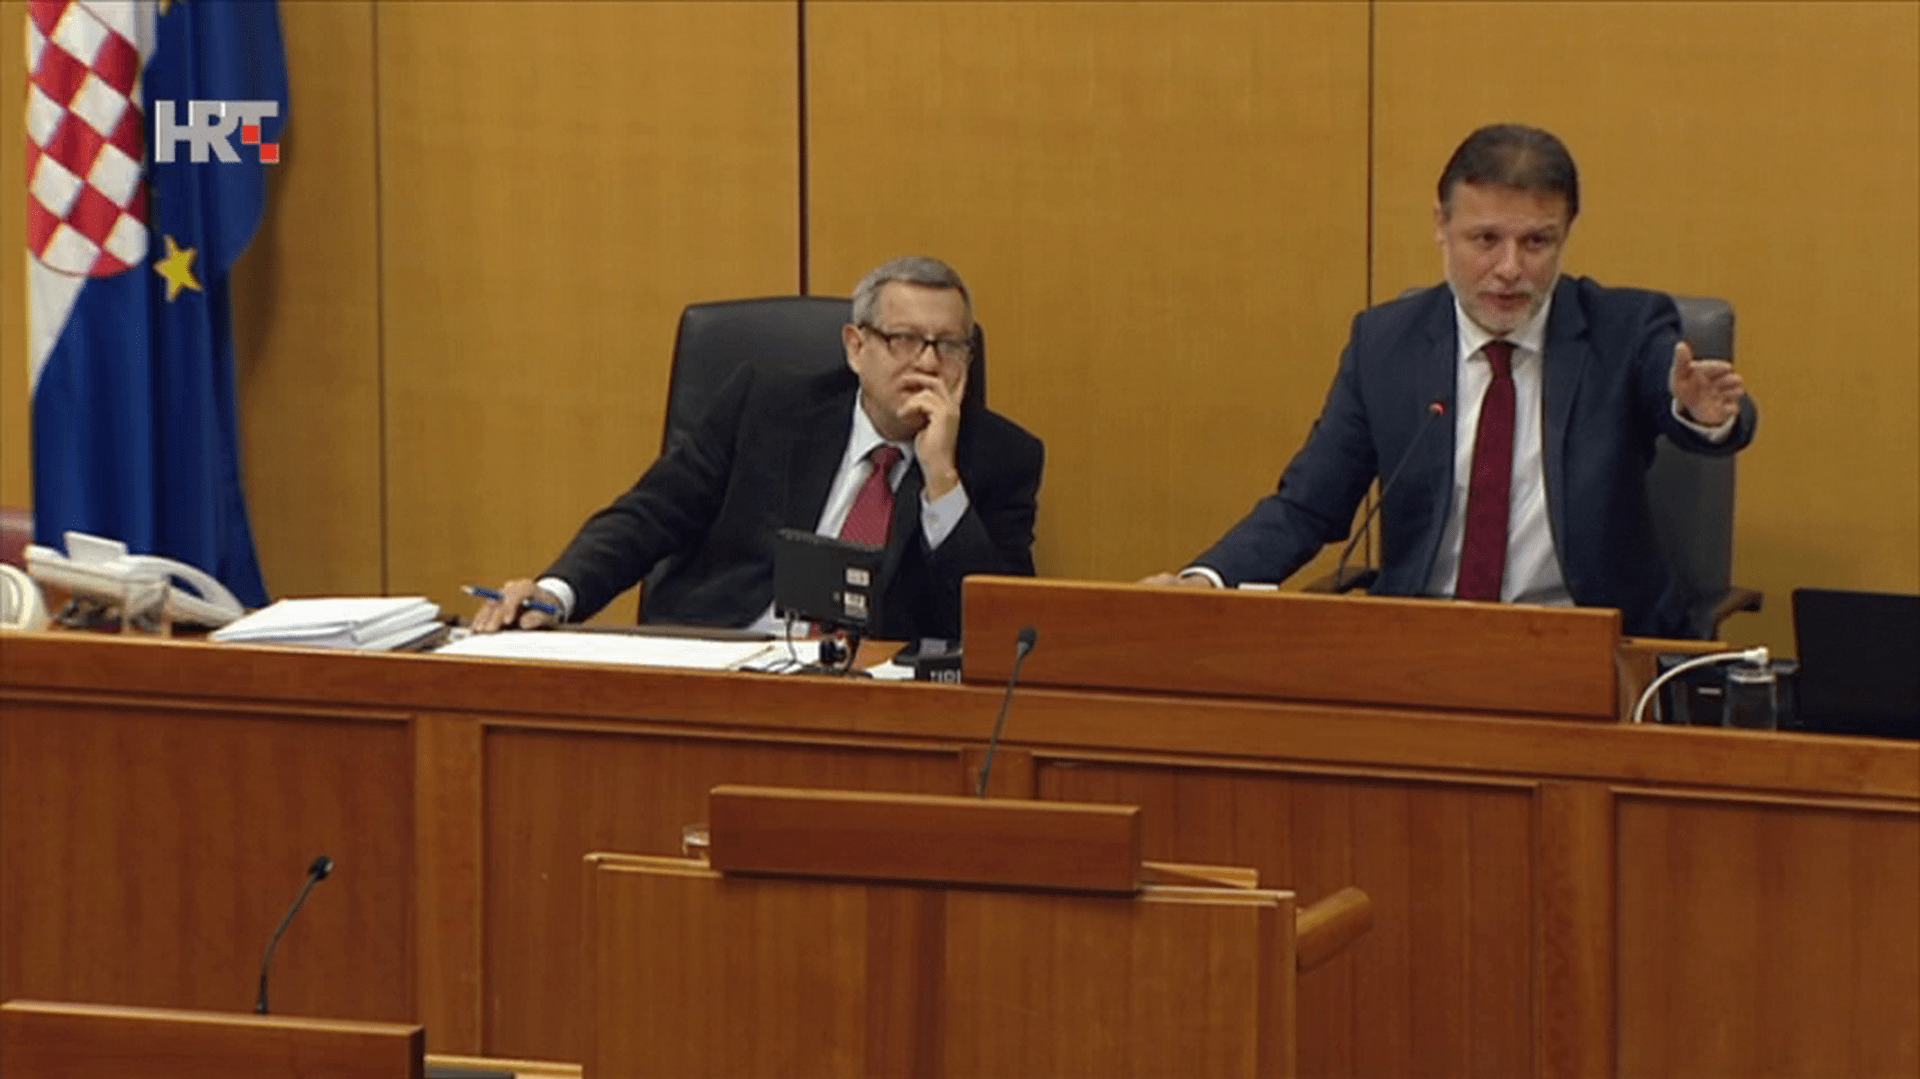 Gordan Jandroković Presidente del Parlamento. (Foto: HRT.hr)